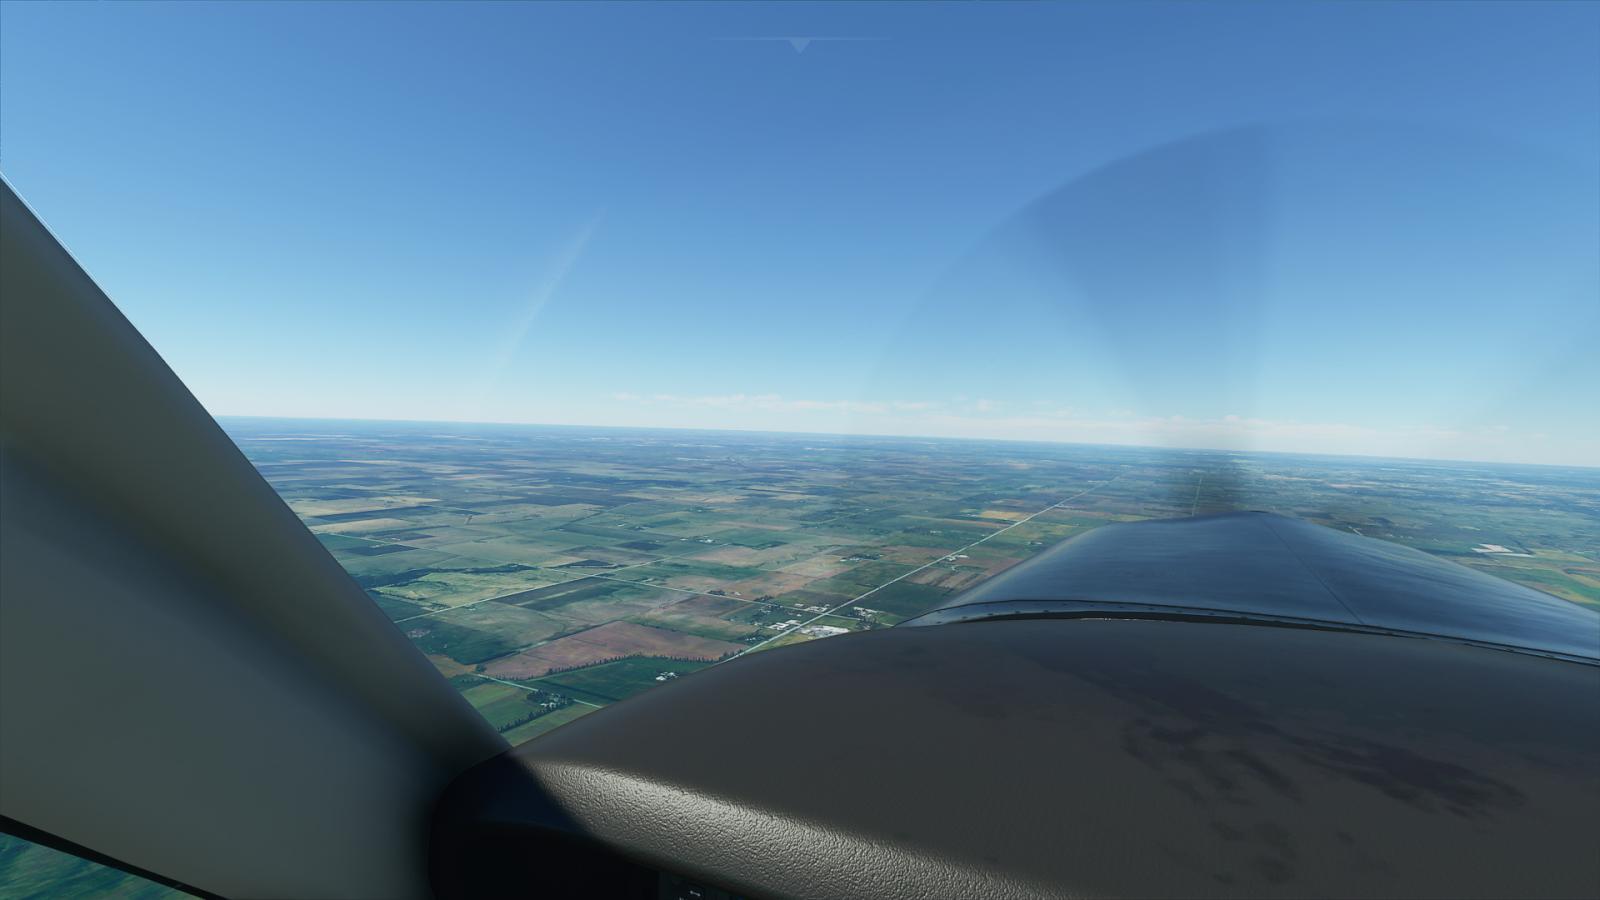 İsim:  Microsoft Flight Simulator Screenshot 2020.08.21 - 23.01.20.59.jpg Görüntüleme: 122 Büyüklük:  81.1 KB (Kilobyte)